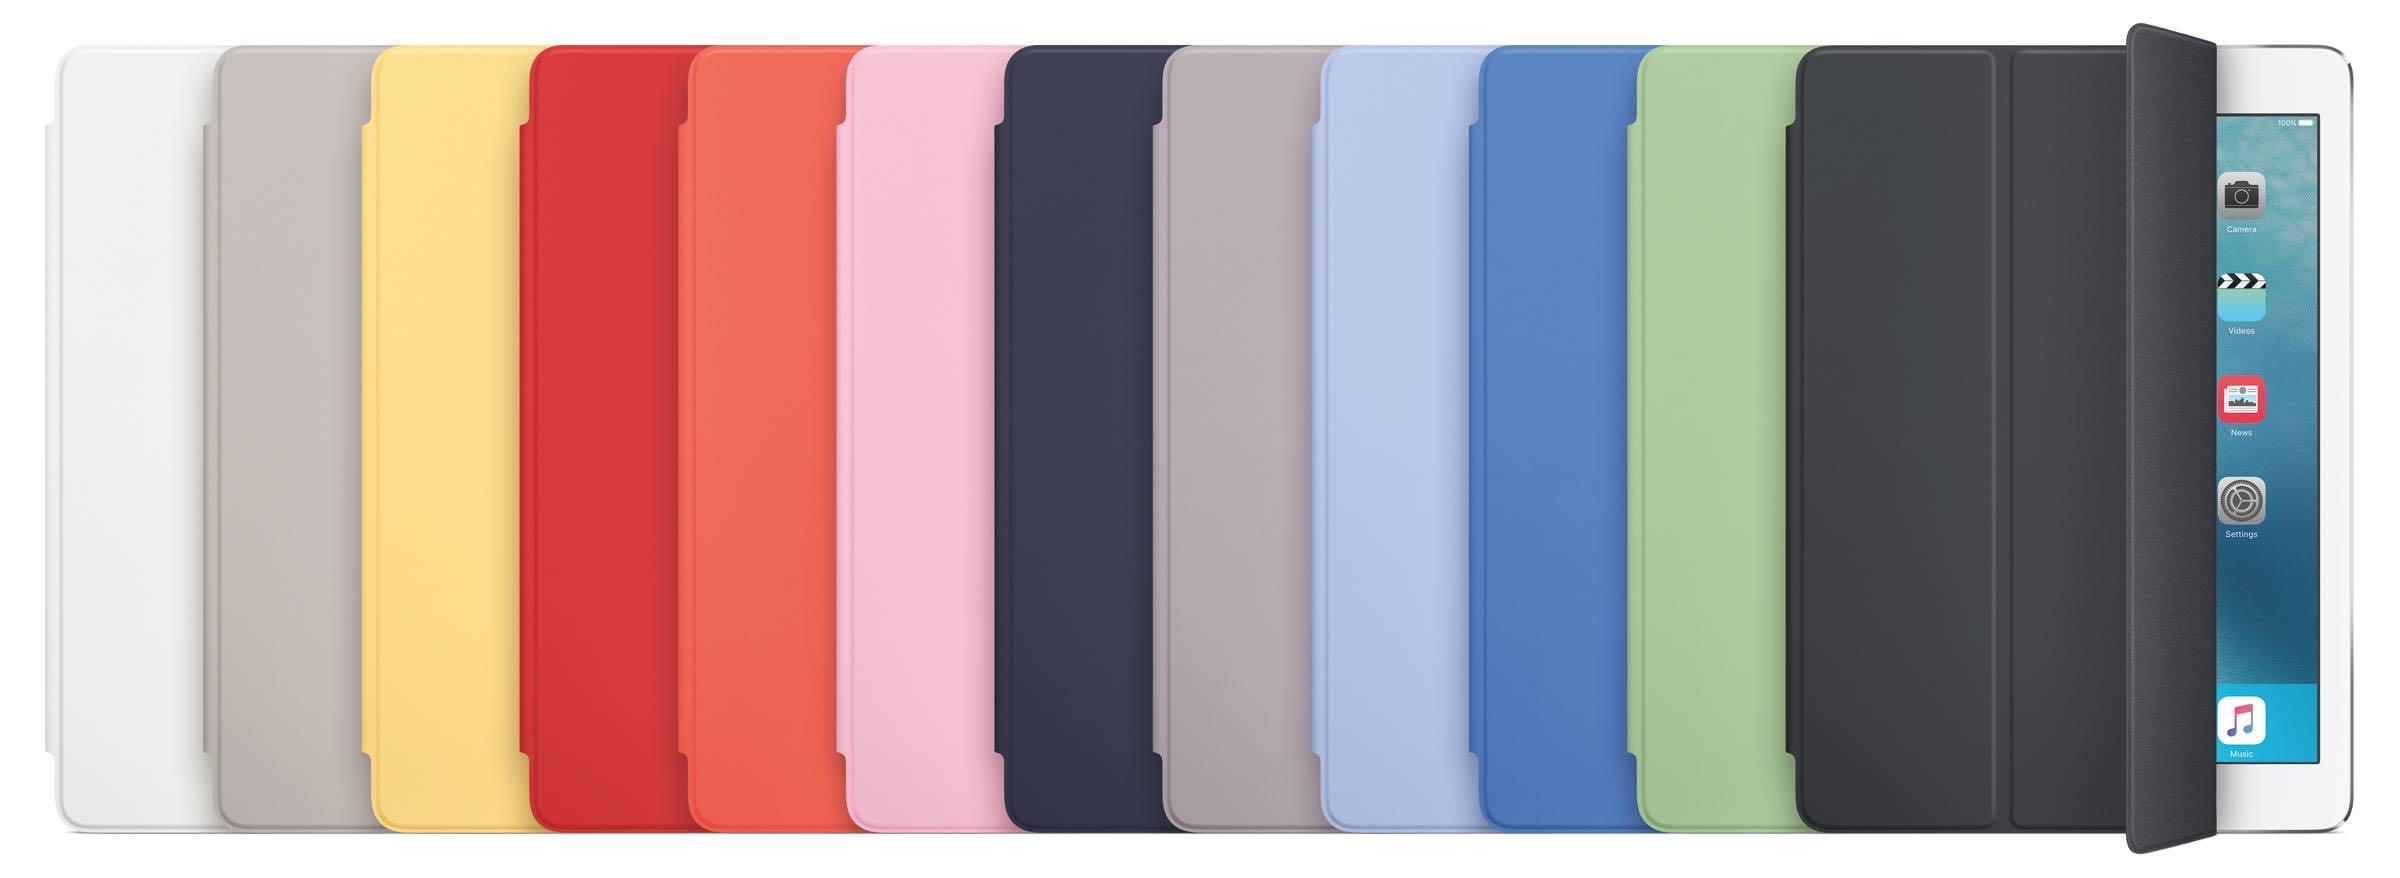 MacBook Pro 2016 12 Case Apple iPad Pro